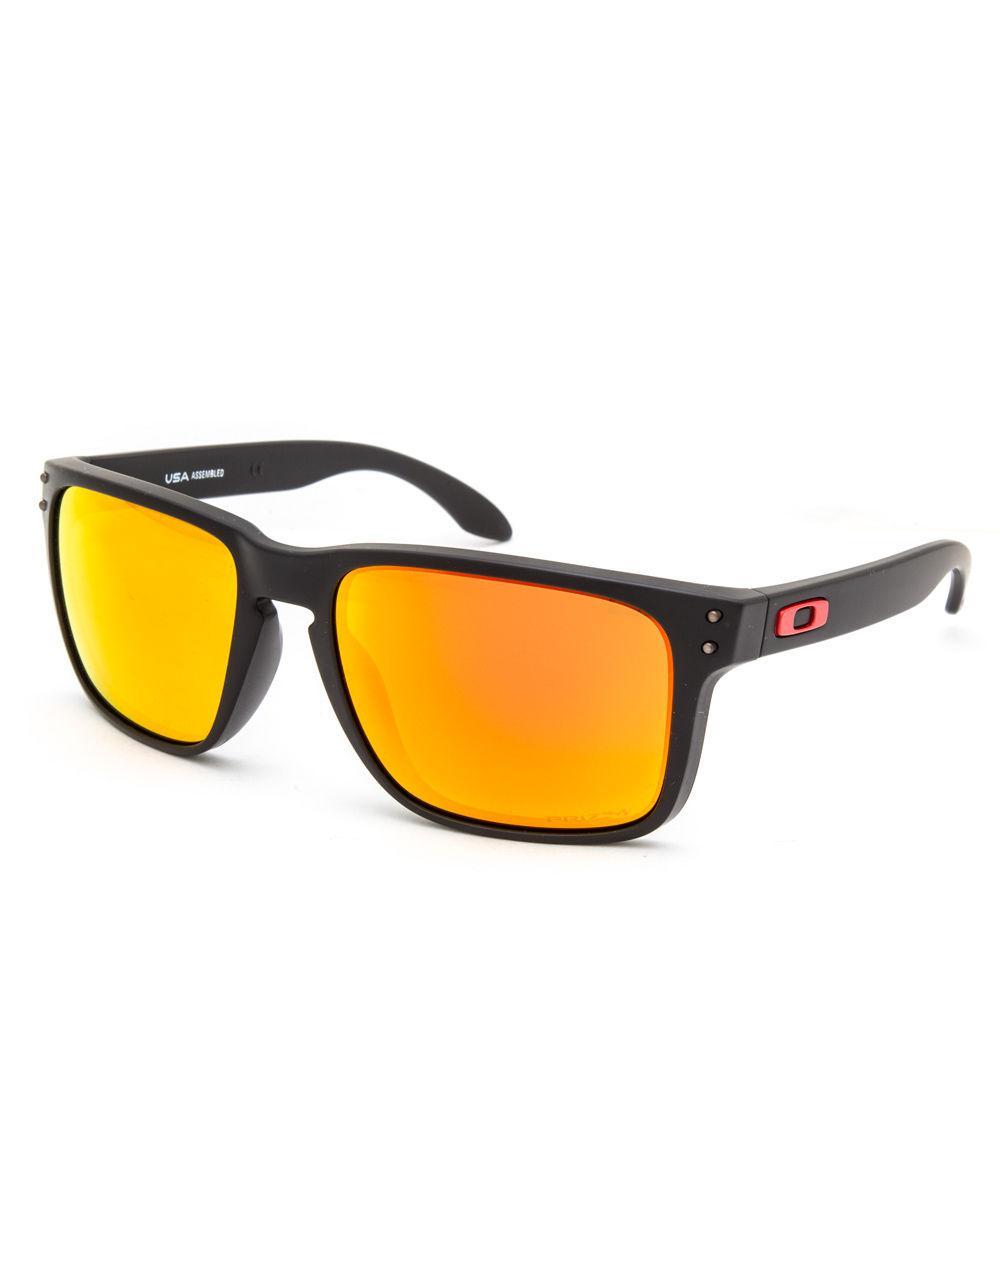 c920975989f0 ... low price lyst oakley holbrook xl matte black prizm ruby sunglasses in  b1ec2 bdaa1